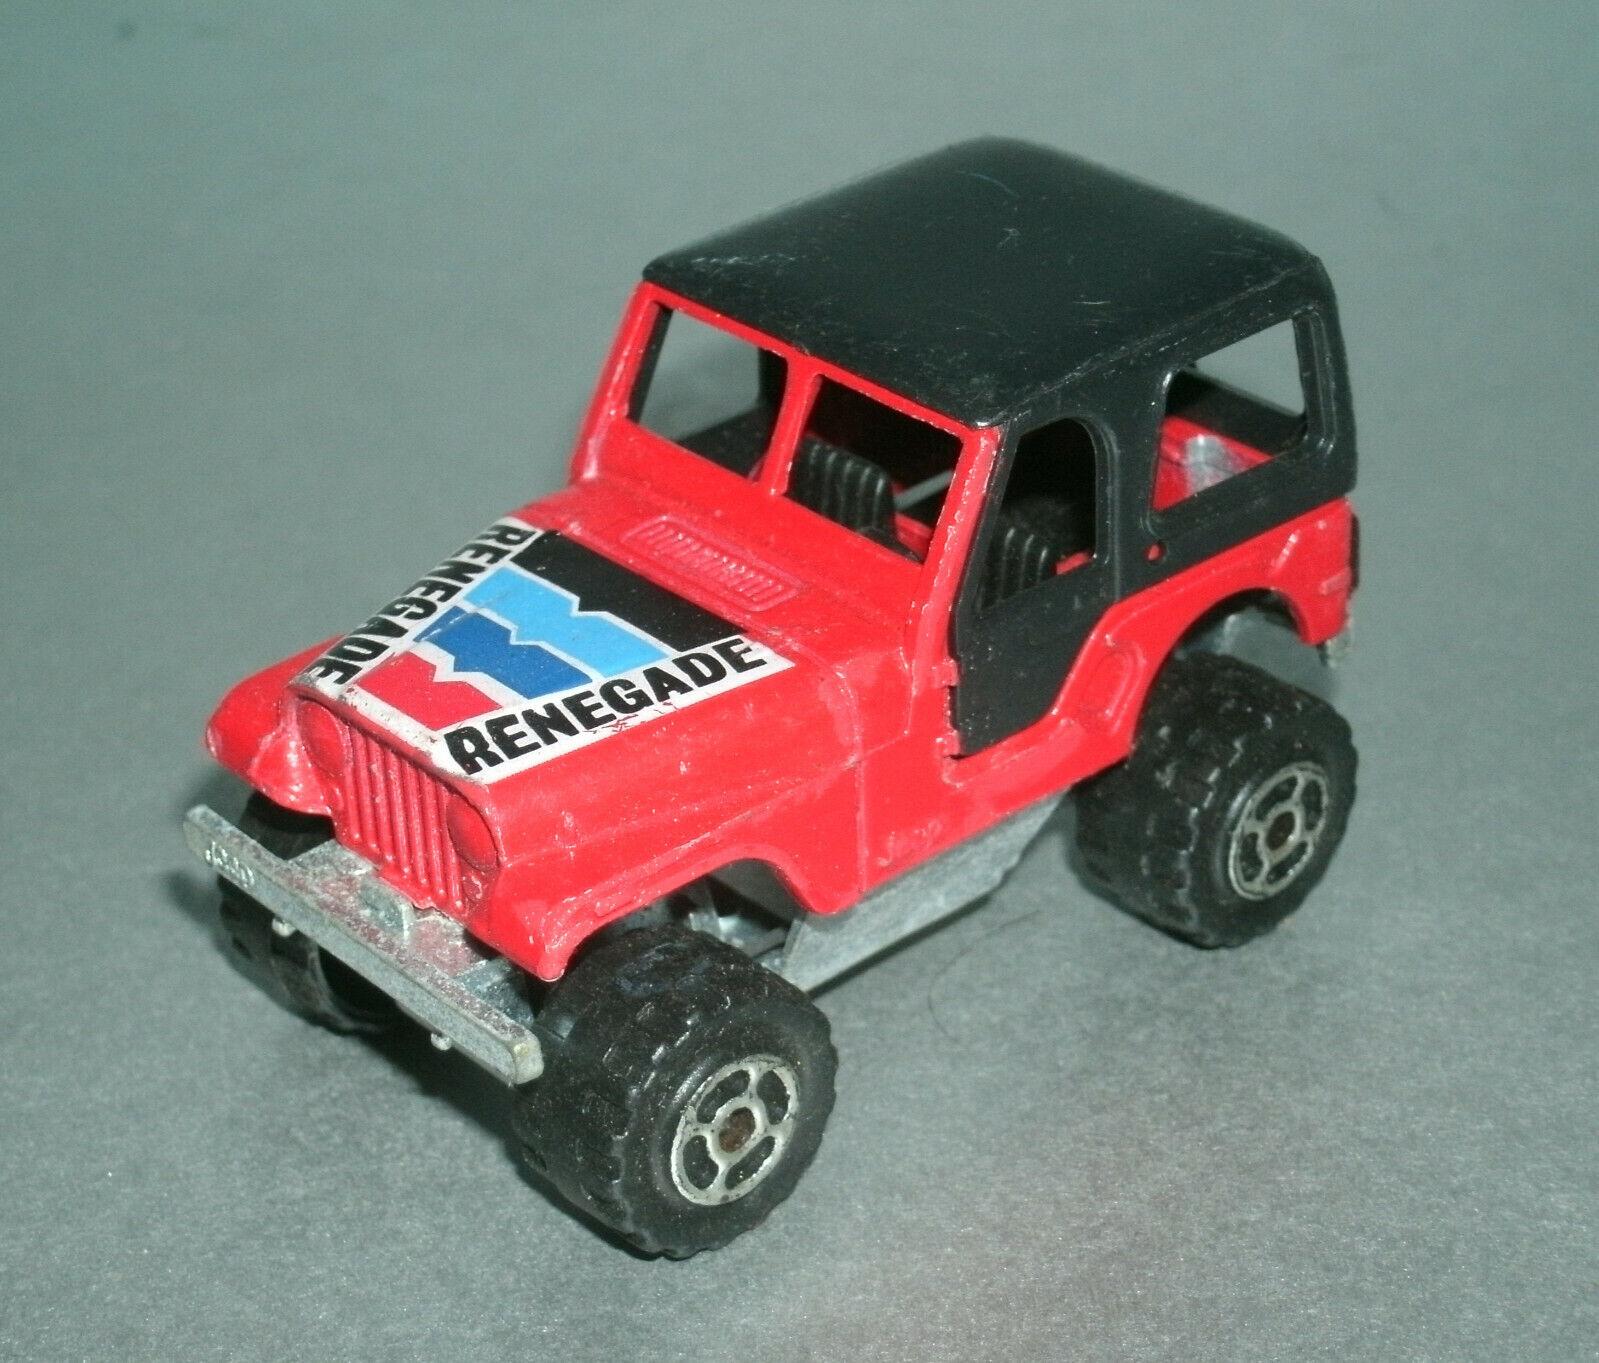 Majorette 244e Bmw X6 Red Matte 1 64 For Sale Online Ebay